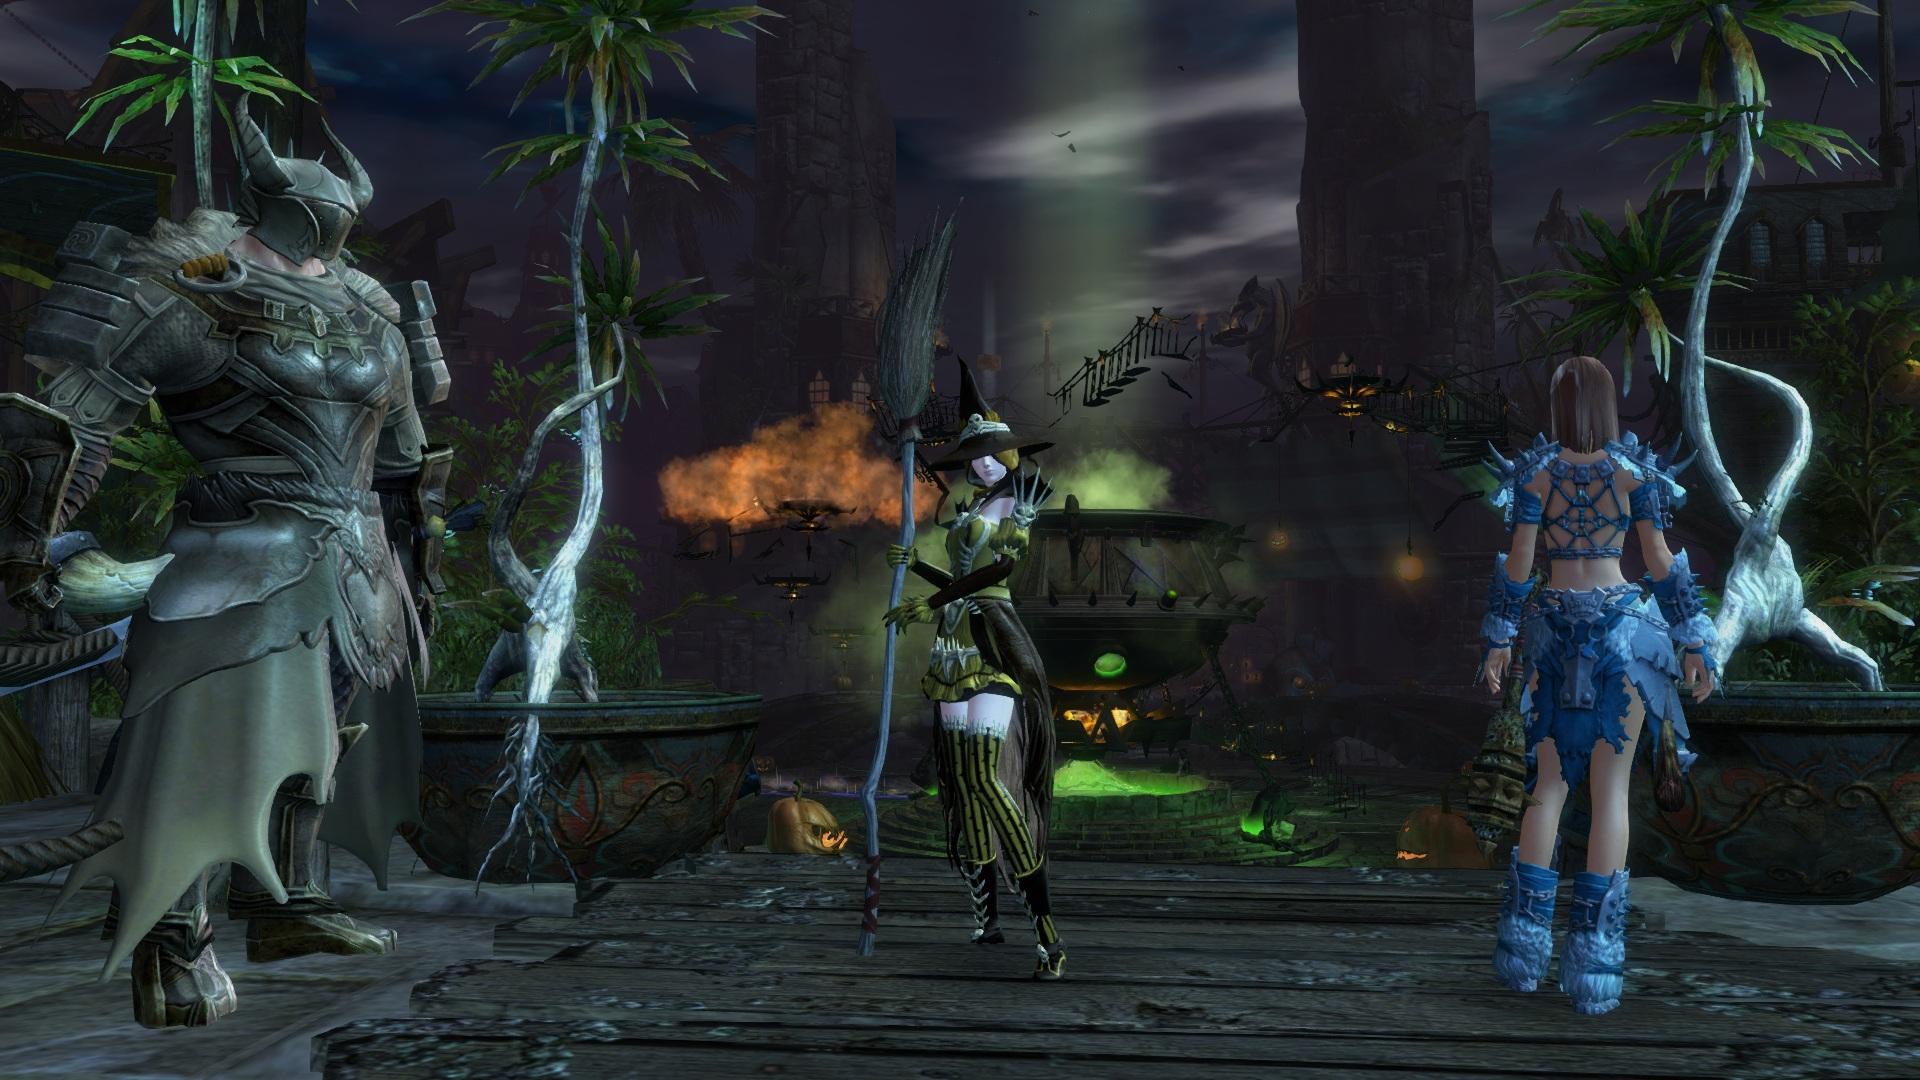 siya games kalkatorik obvious jormag hoping last primordius instead next inb4 update content dragon water fight halloween